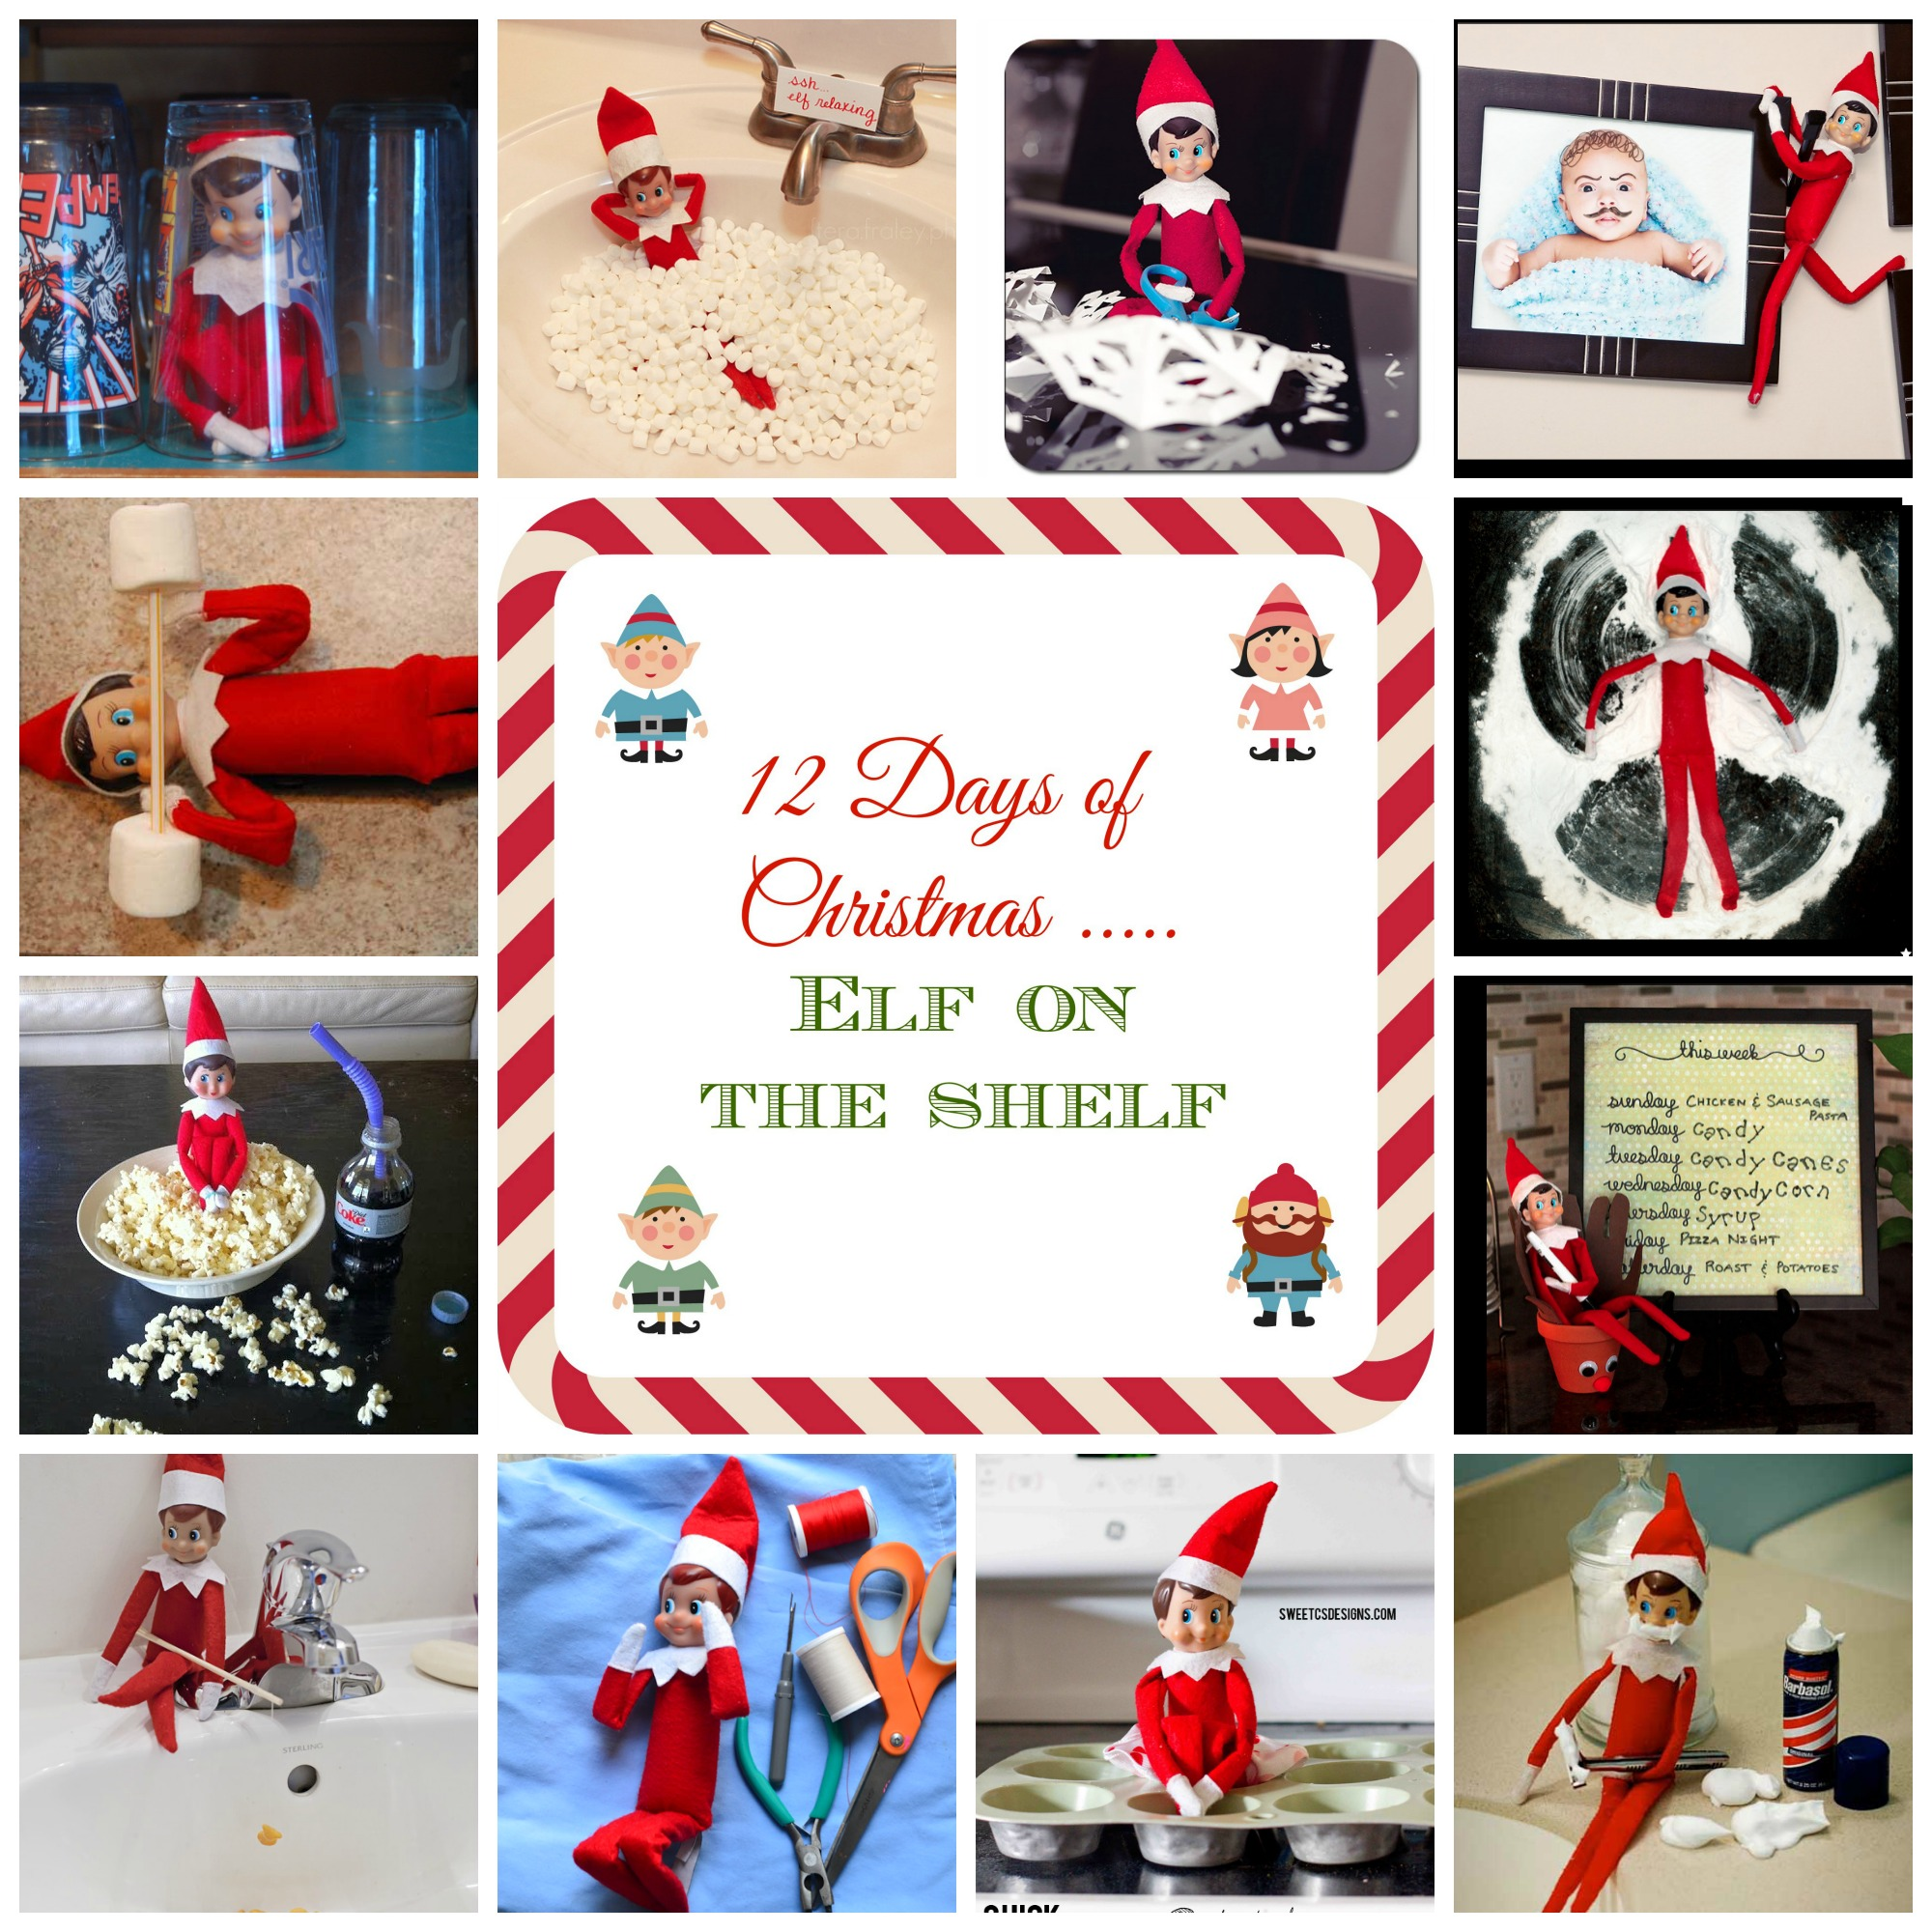 12 Days of Christmas - Elf on the Shelf Ideas - donnahup.com